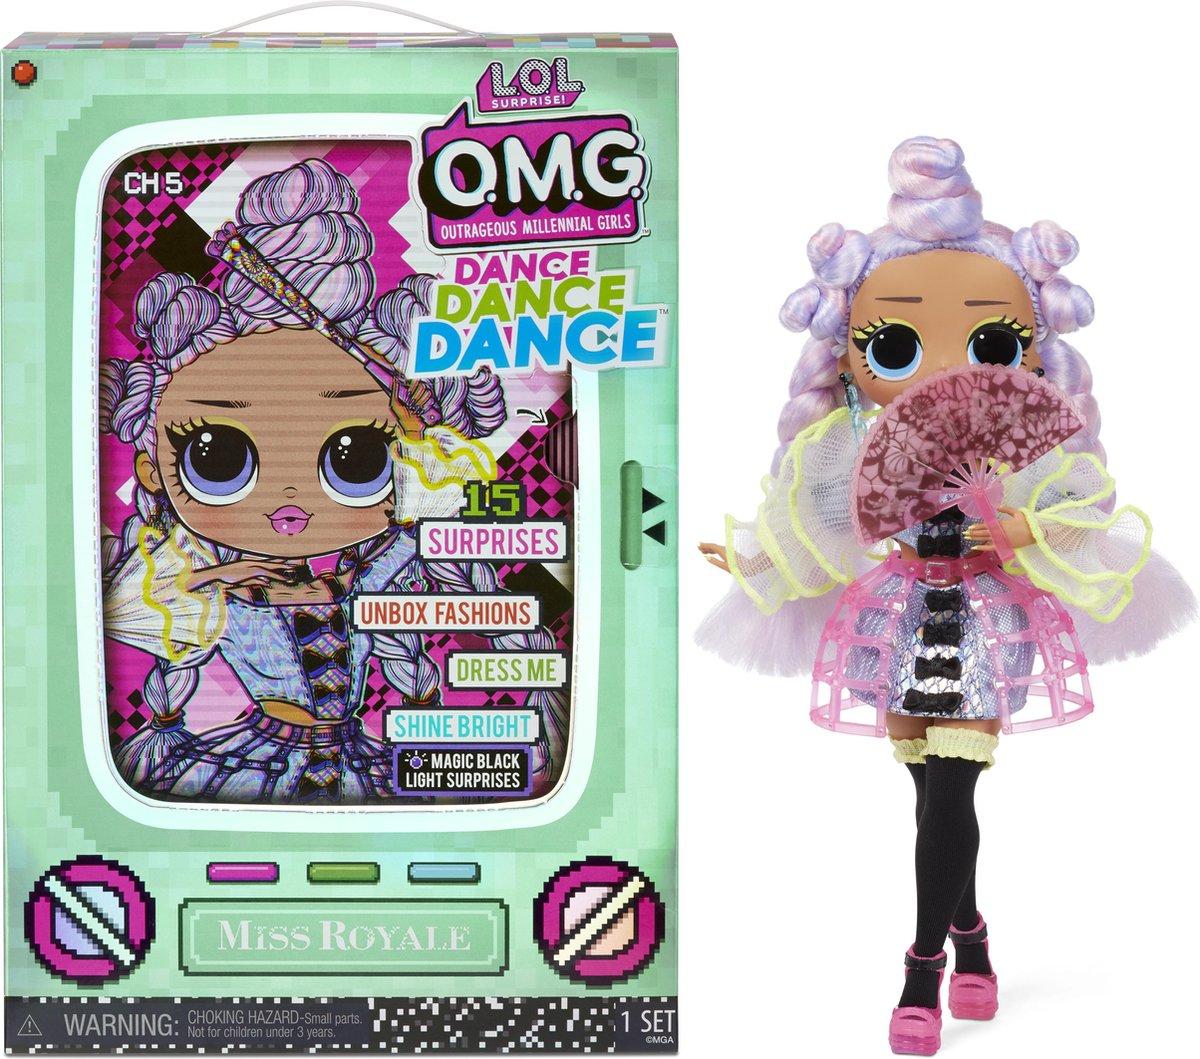 L.O.L. Surprise! OMG Dance Miss Royale - Modepop